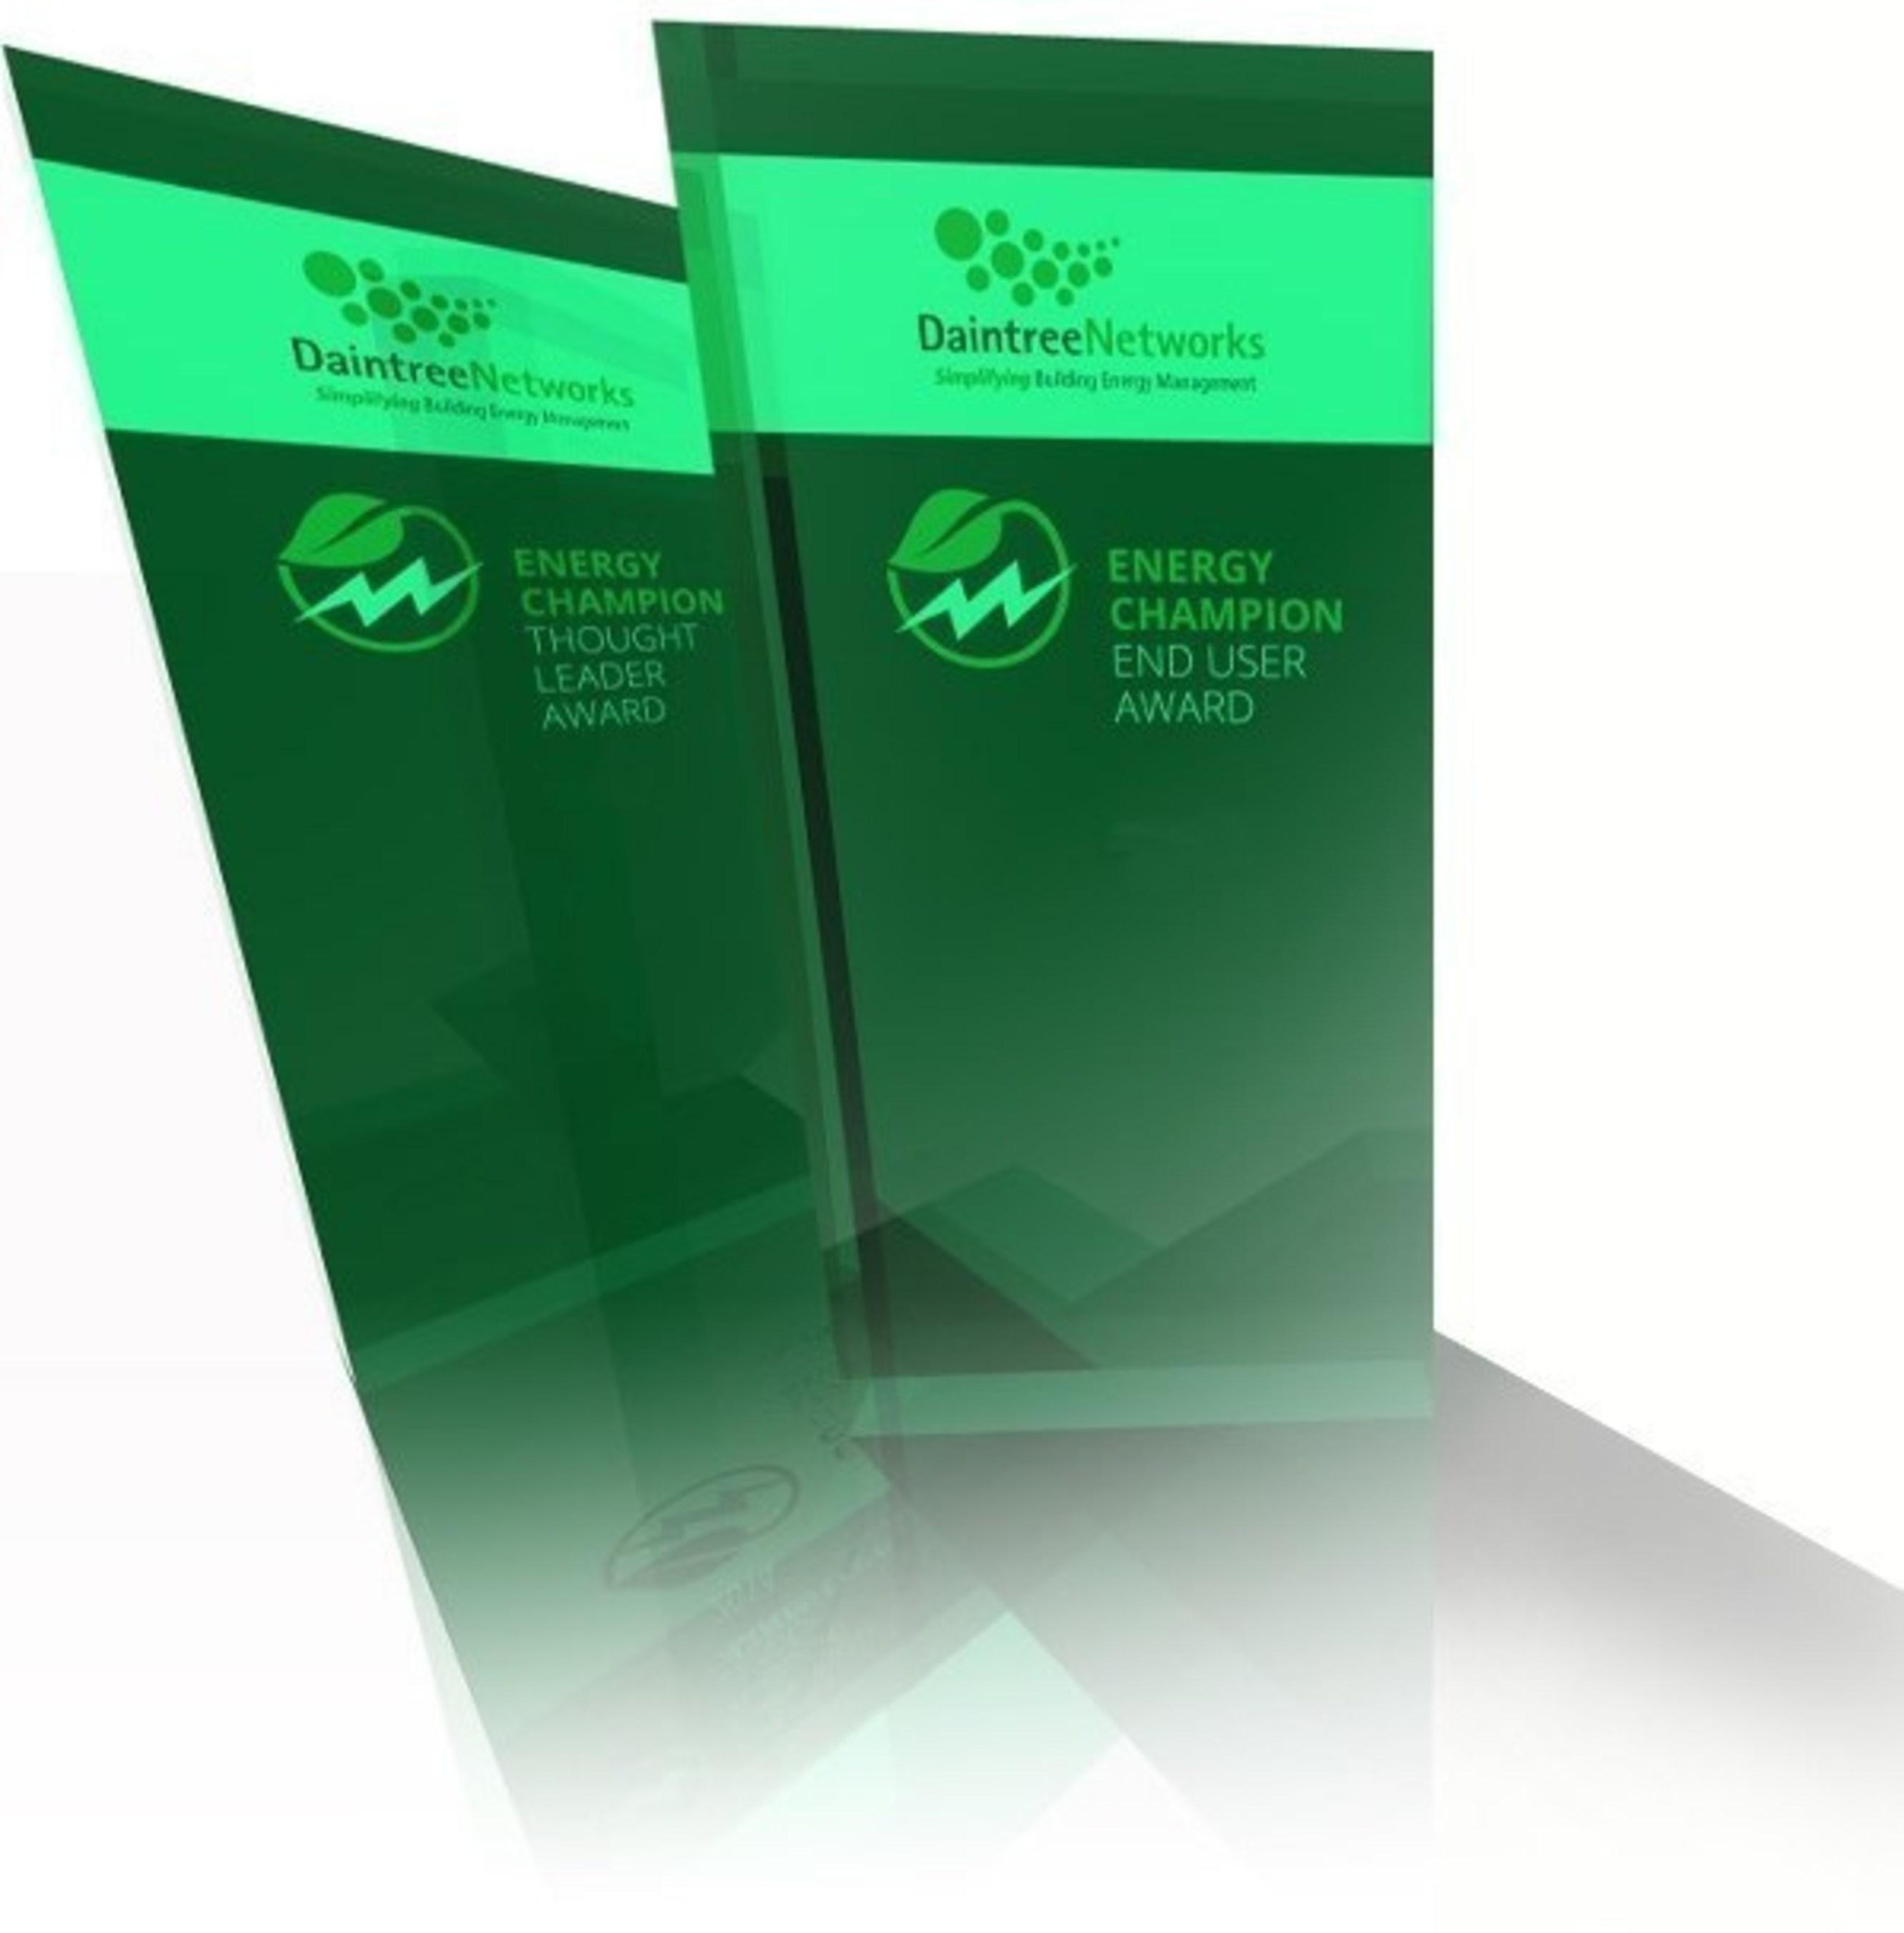 Daintree Networks' Energy Champion Awards